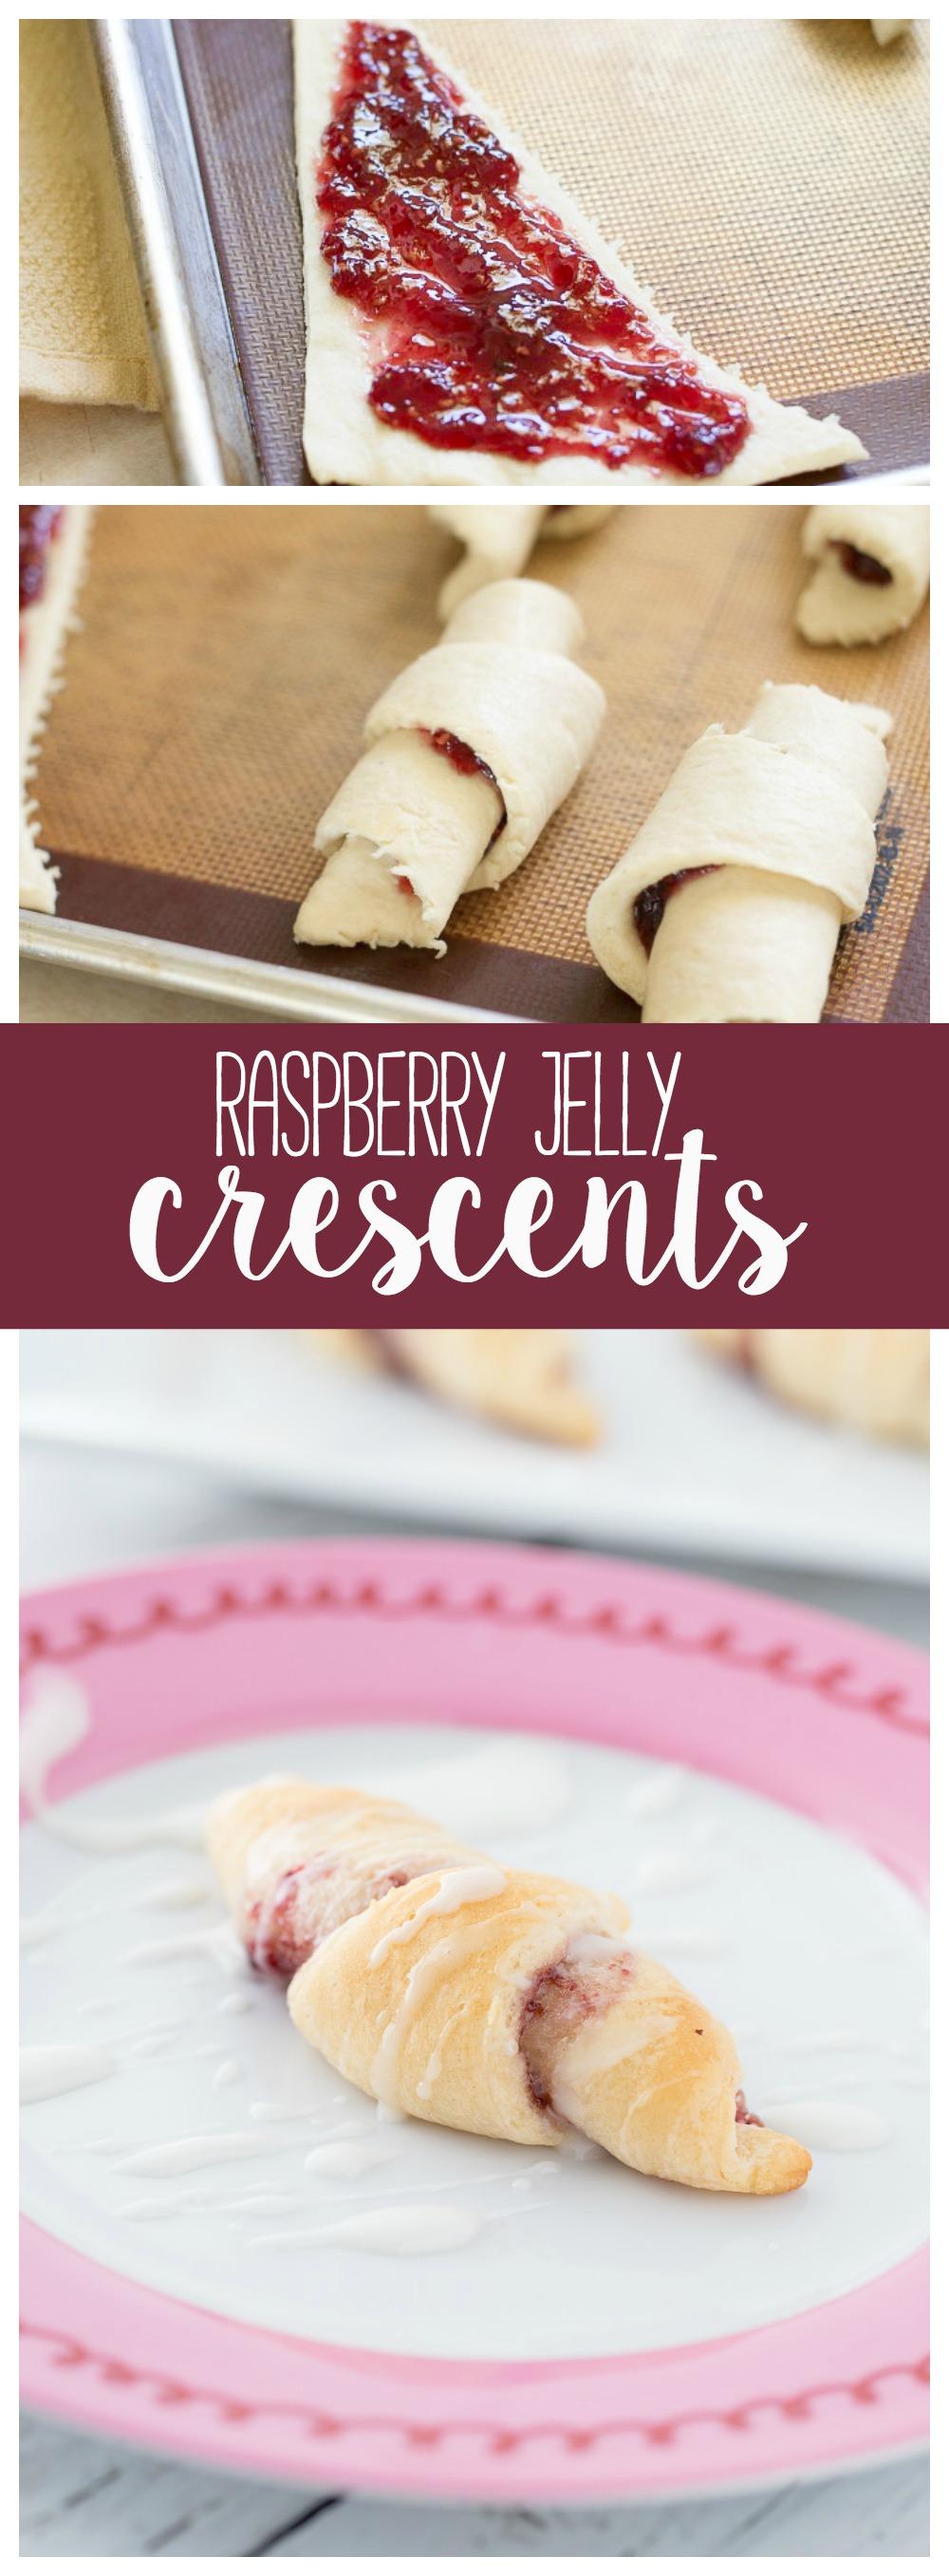 Raspberry Crescent Rolls | Crescent Rolls | Dessert | Simple Desserts